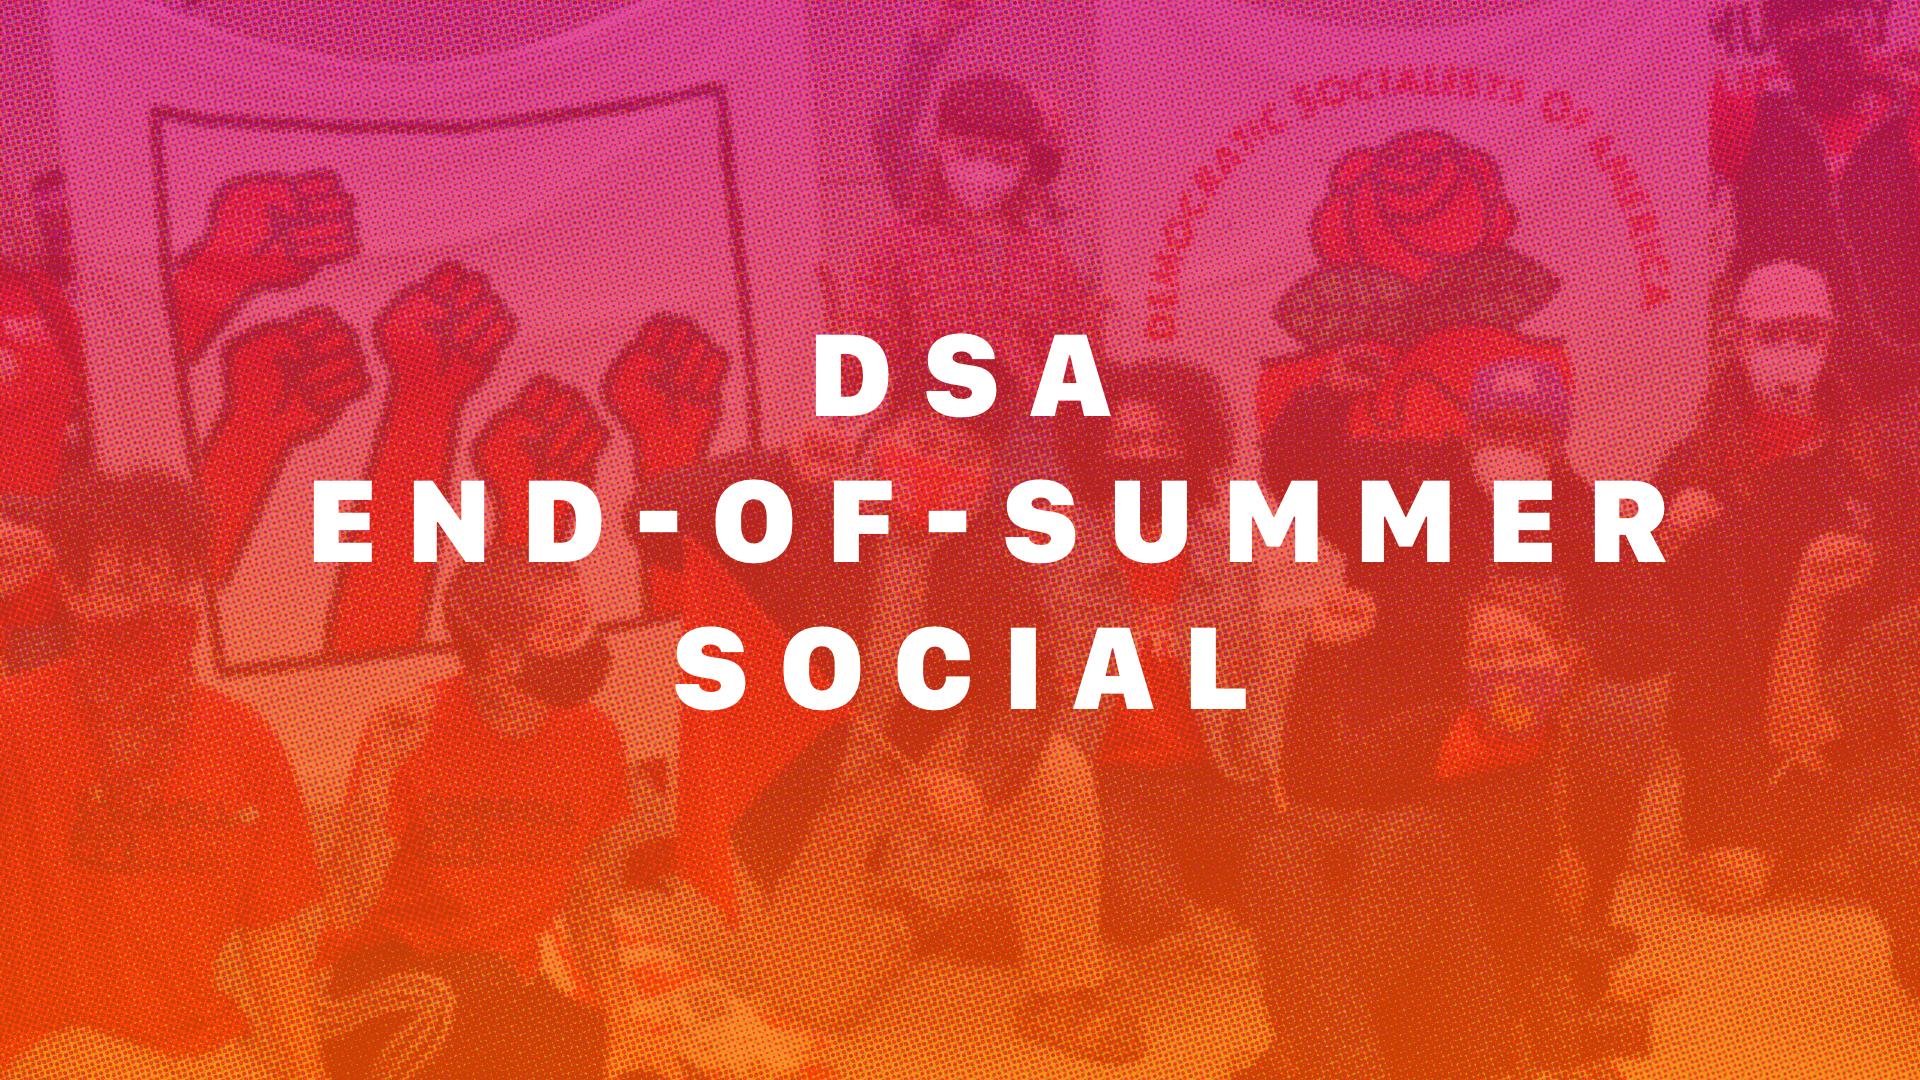 DSA End-Of-Summer Social @ Snow Park